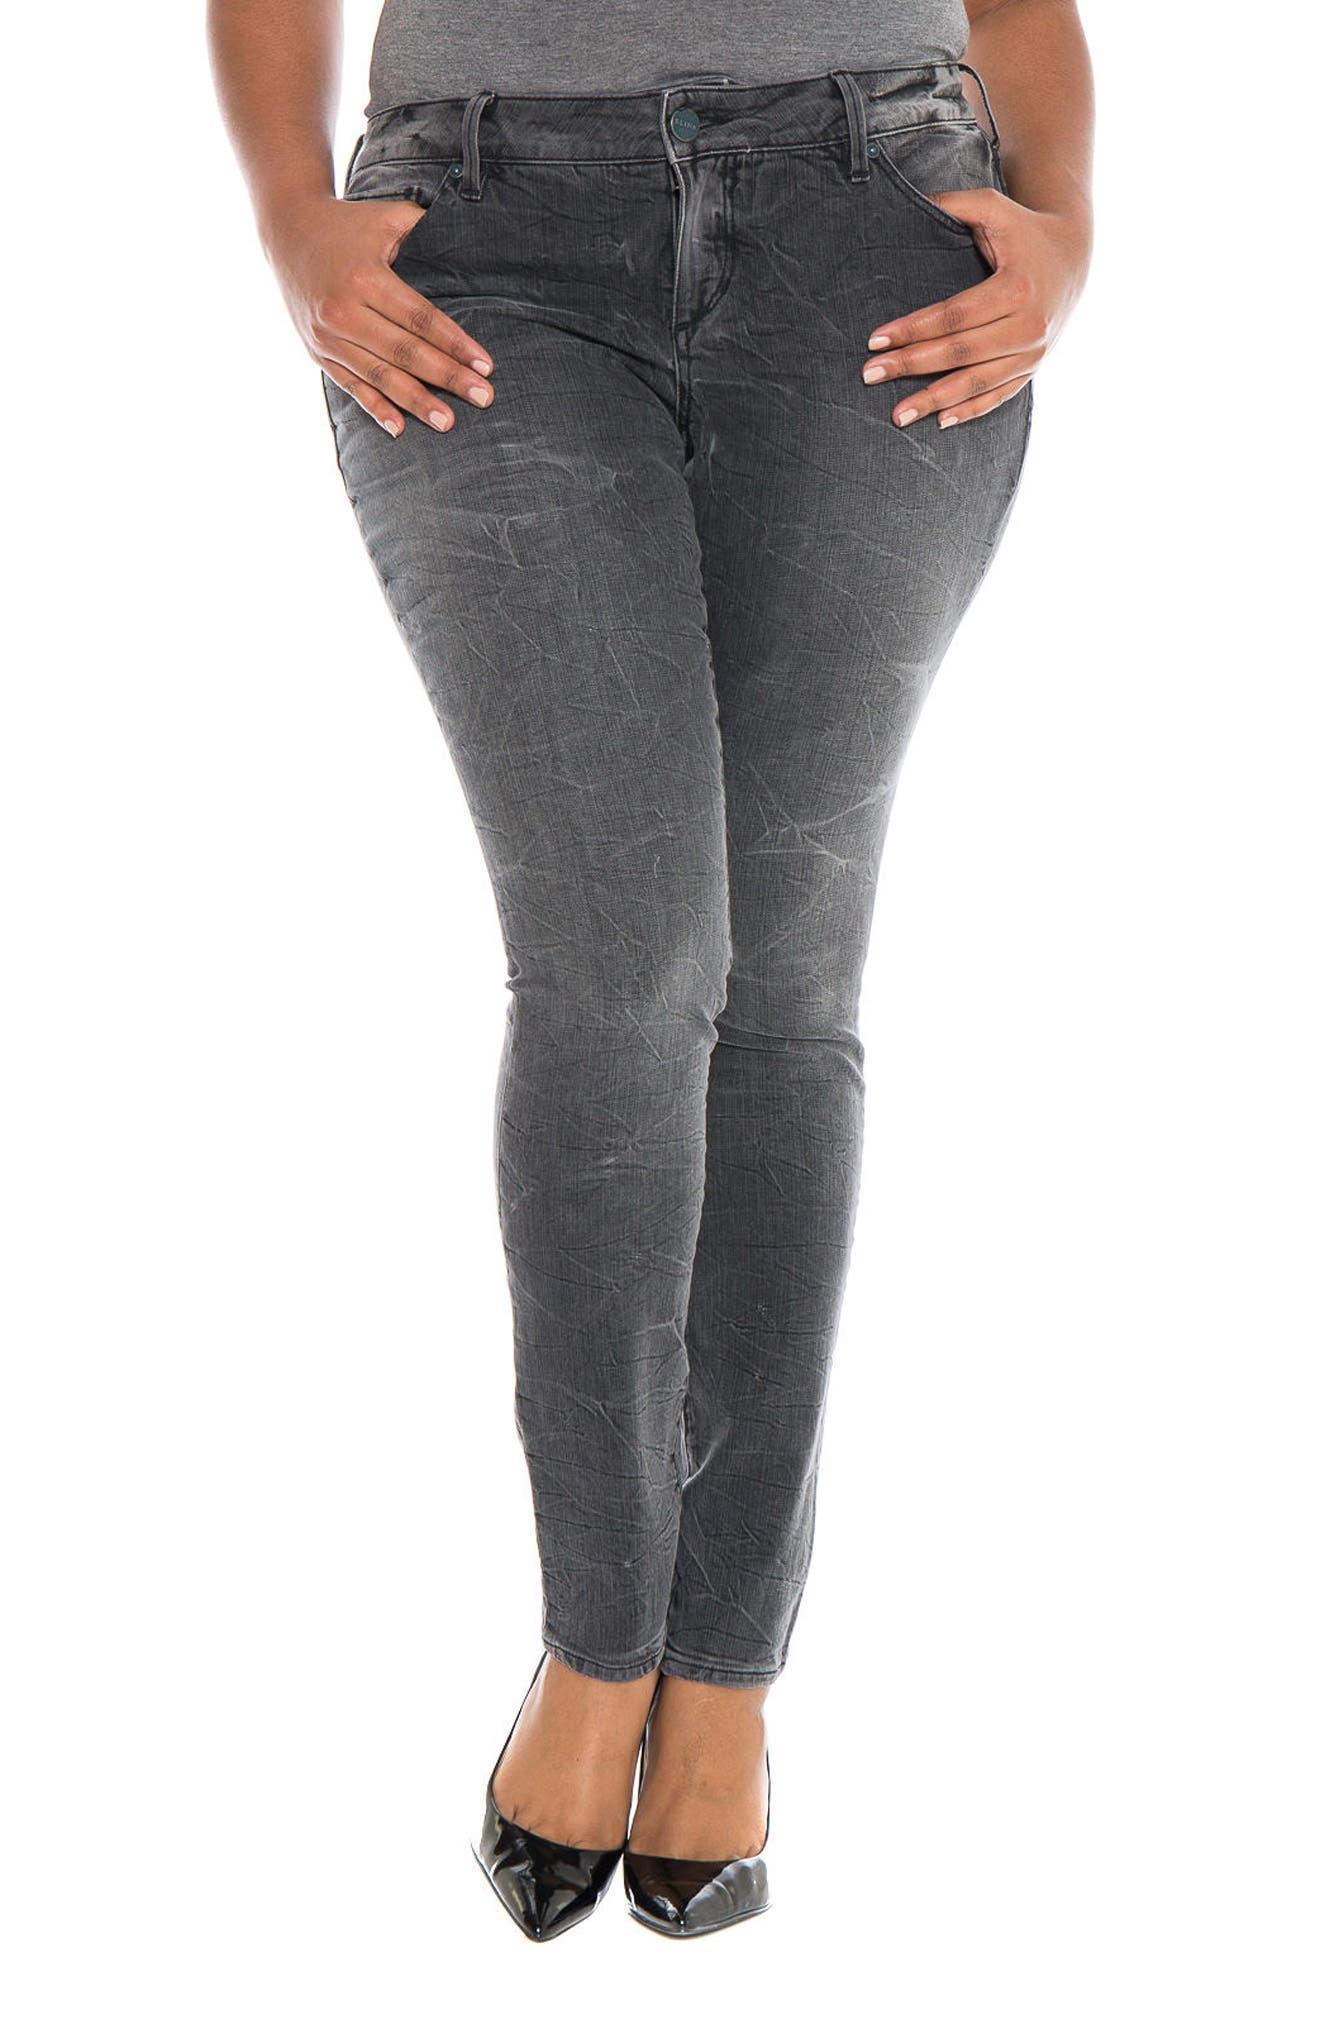 SLINK Jeans Stretch Skinny Jeans (Caitlin) (Plus Size)